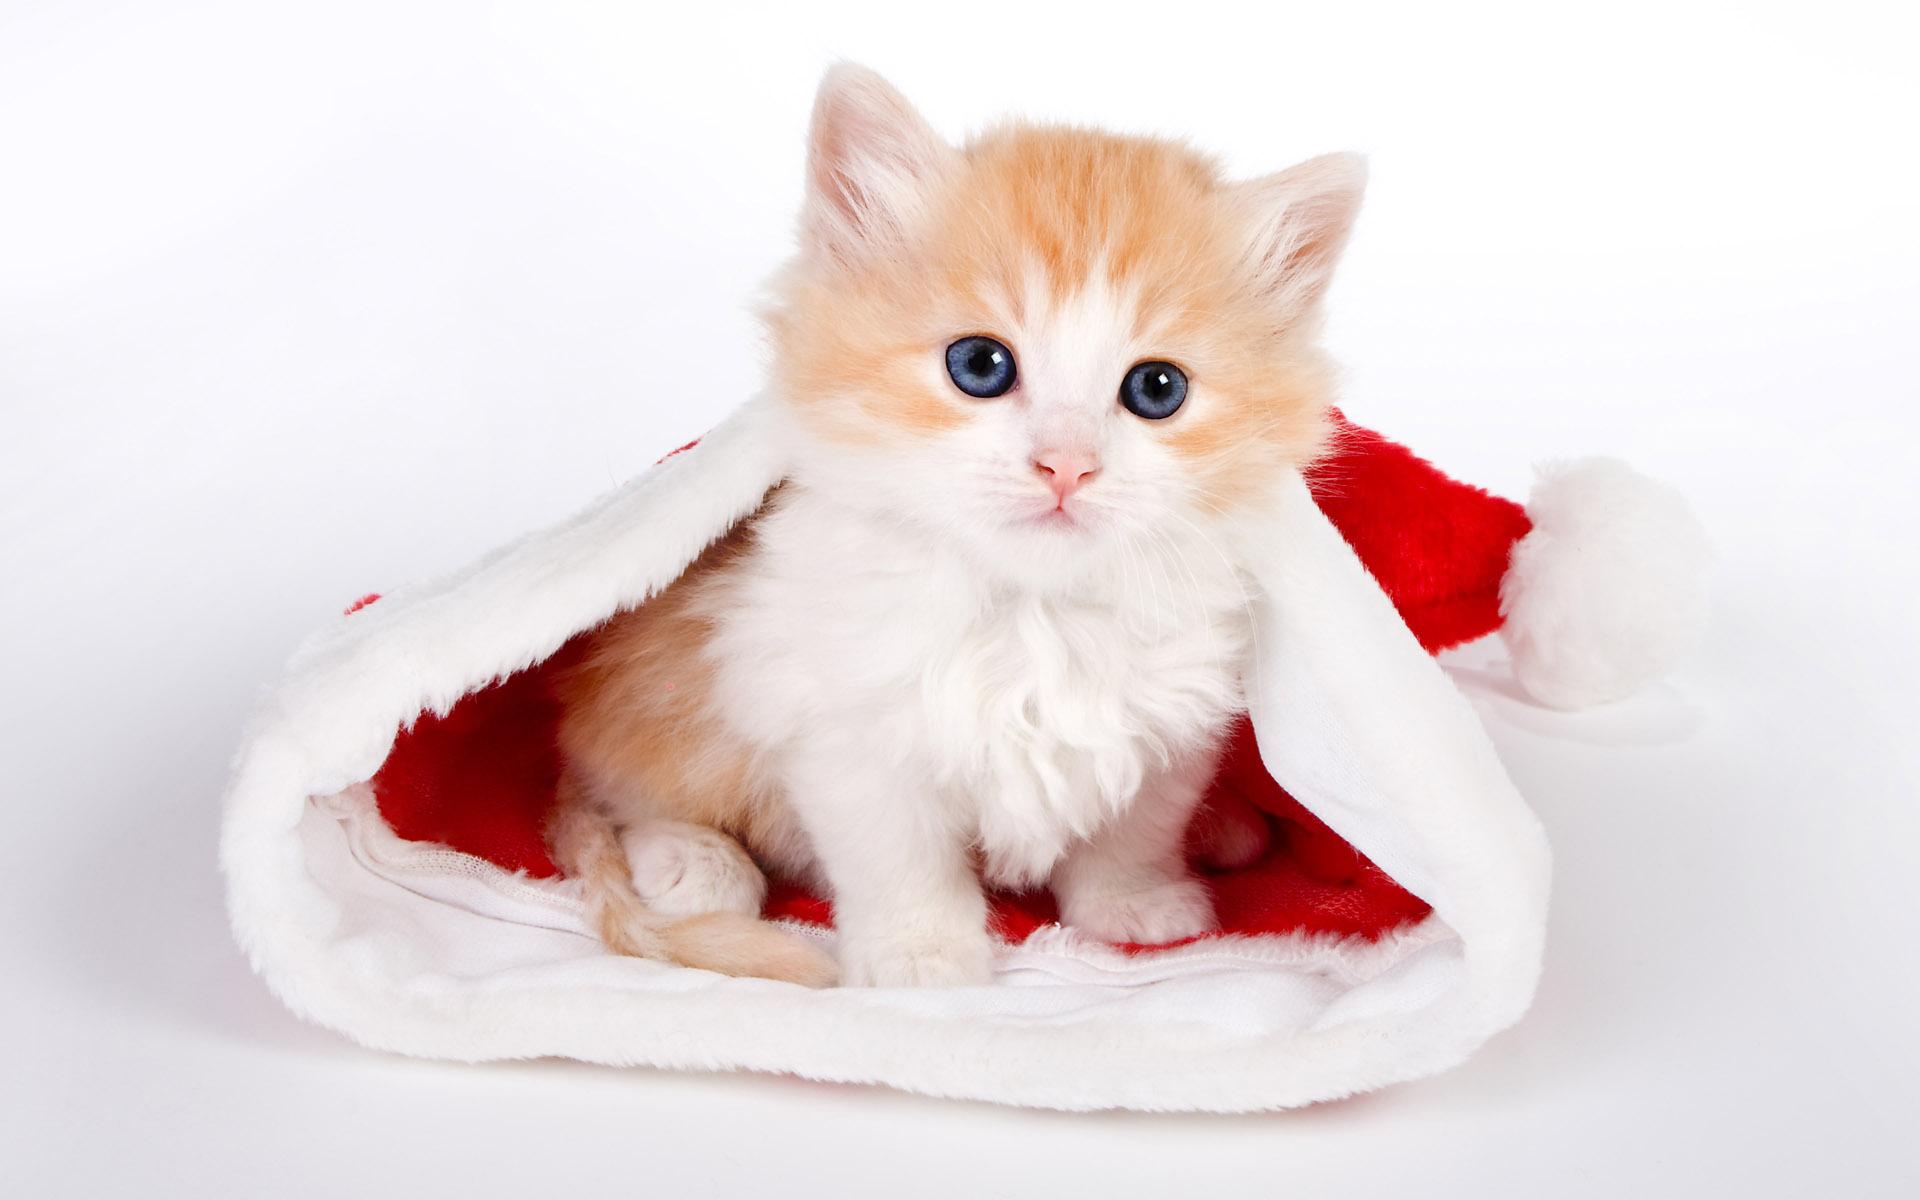 cute baby cat wallpaper